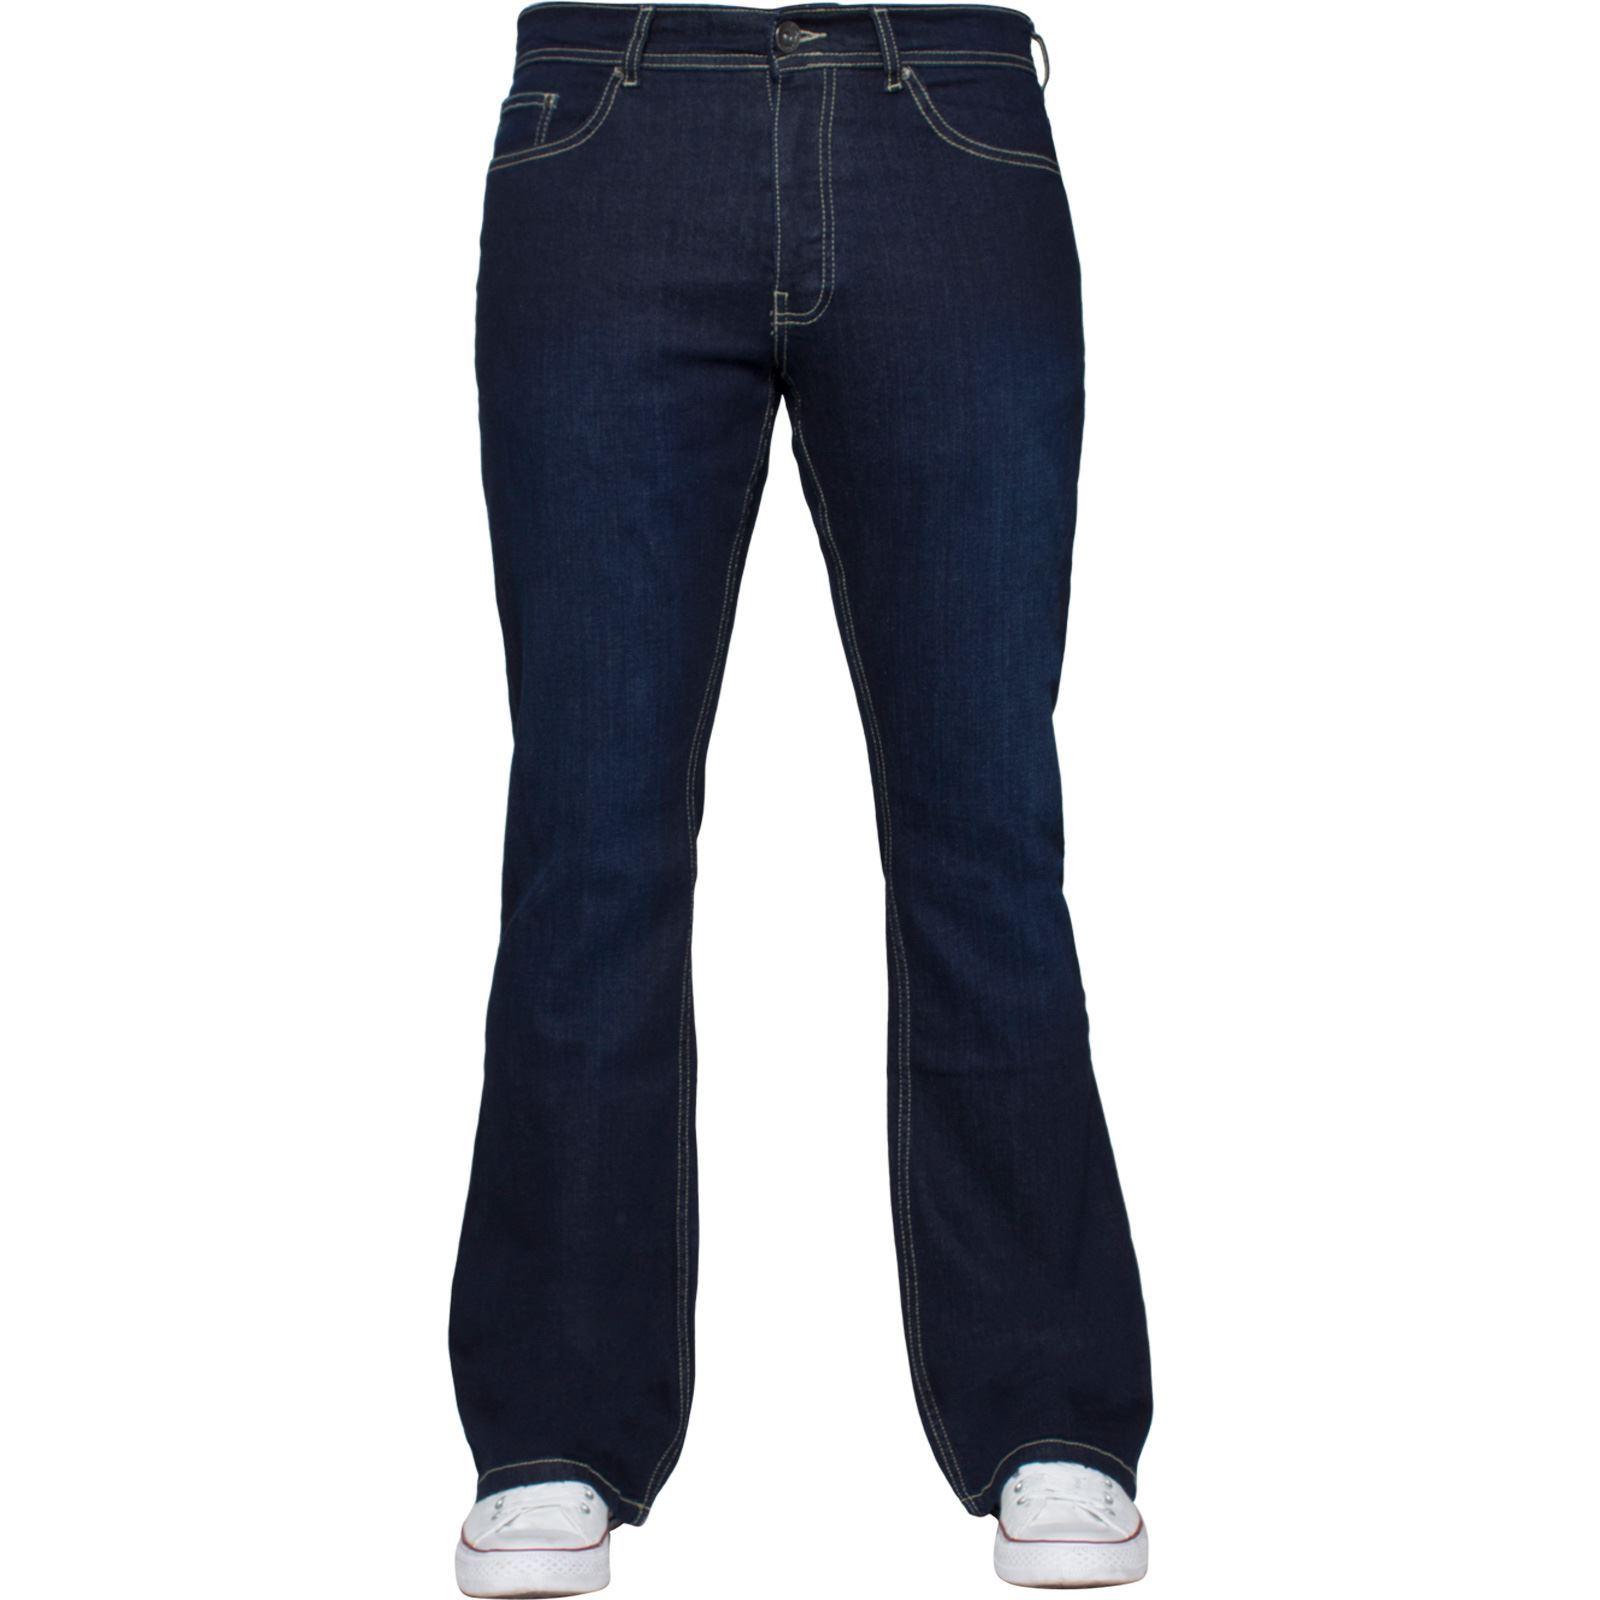 Para-Hombre-Pierna-Recta-Bootcut-Stretch-Denim-Regulares-Pantalon-de-trabajo-Kruze-Todas-Cinturas miniatura 93